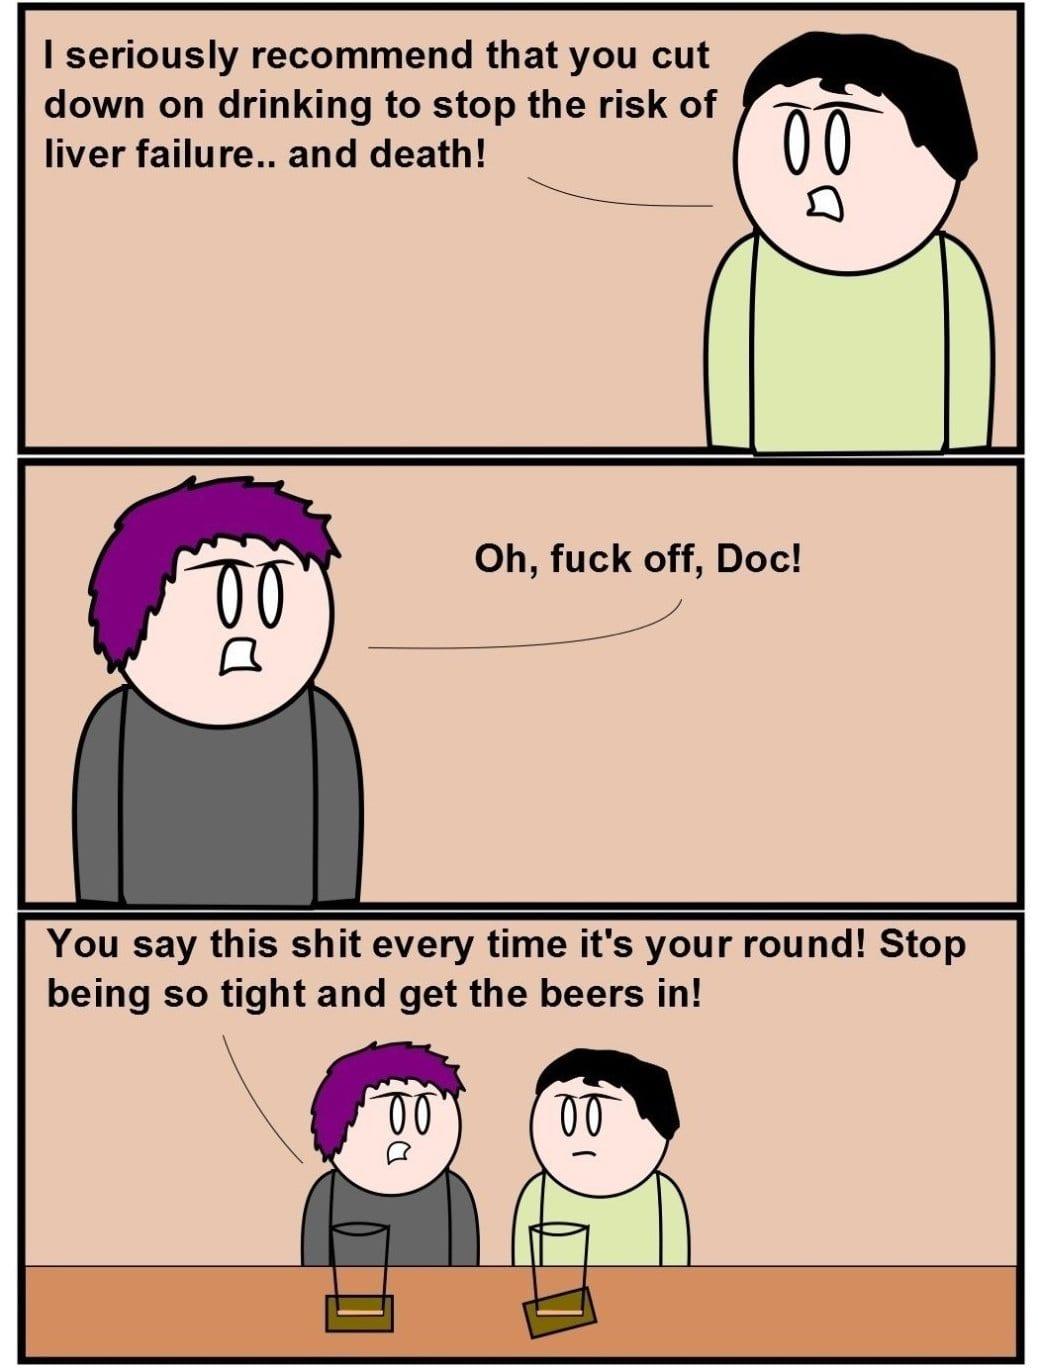 Funny Lol Meme Tumblr : Funny lol meme sparky doodles alcohol